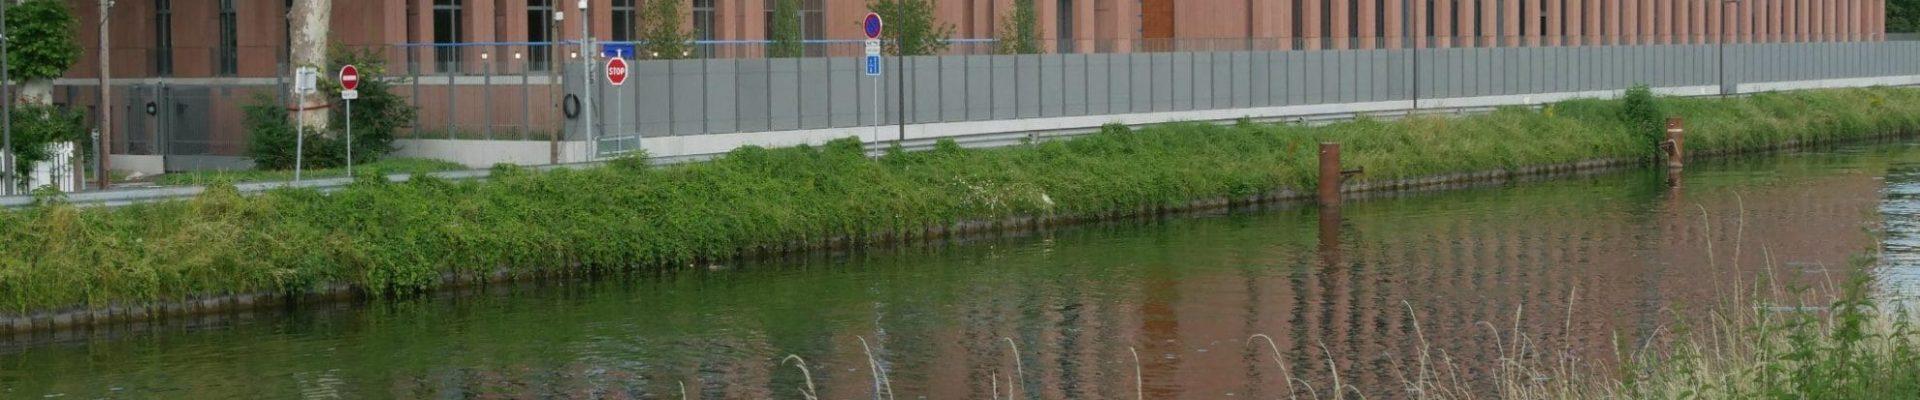 Rue89 Strasbourg – visite du nouveau consulat de Turquie